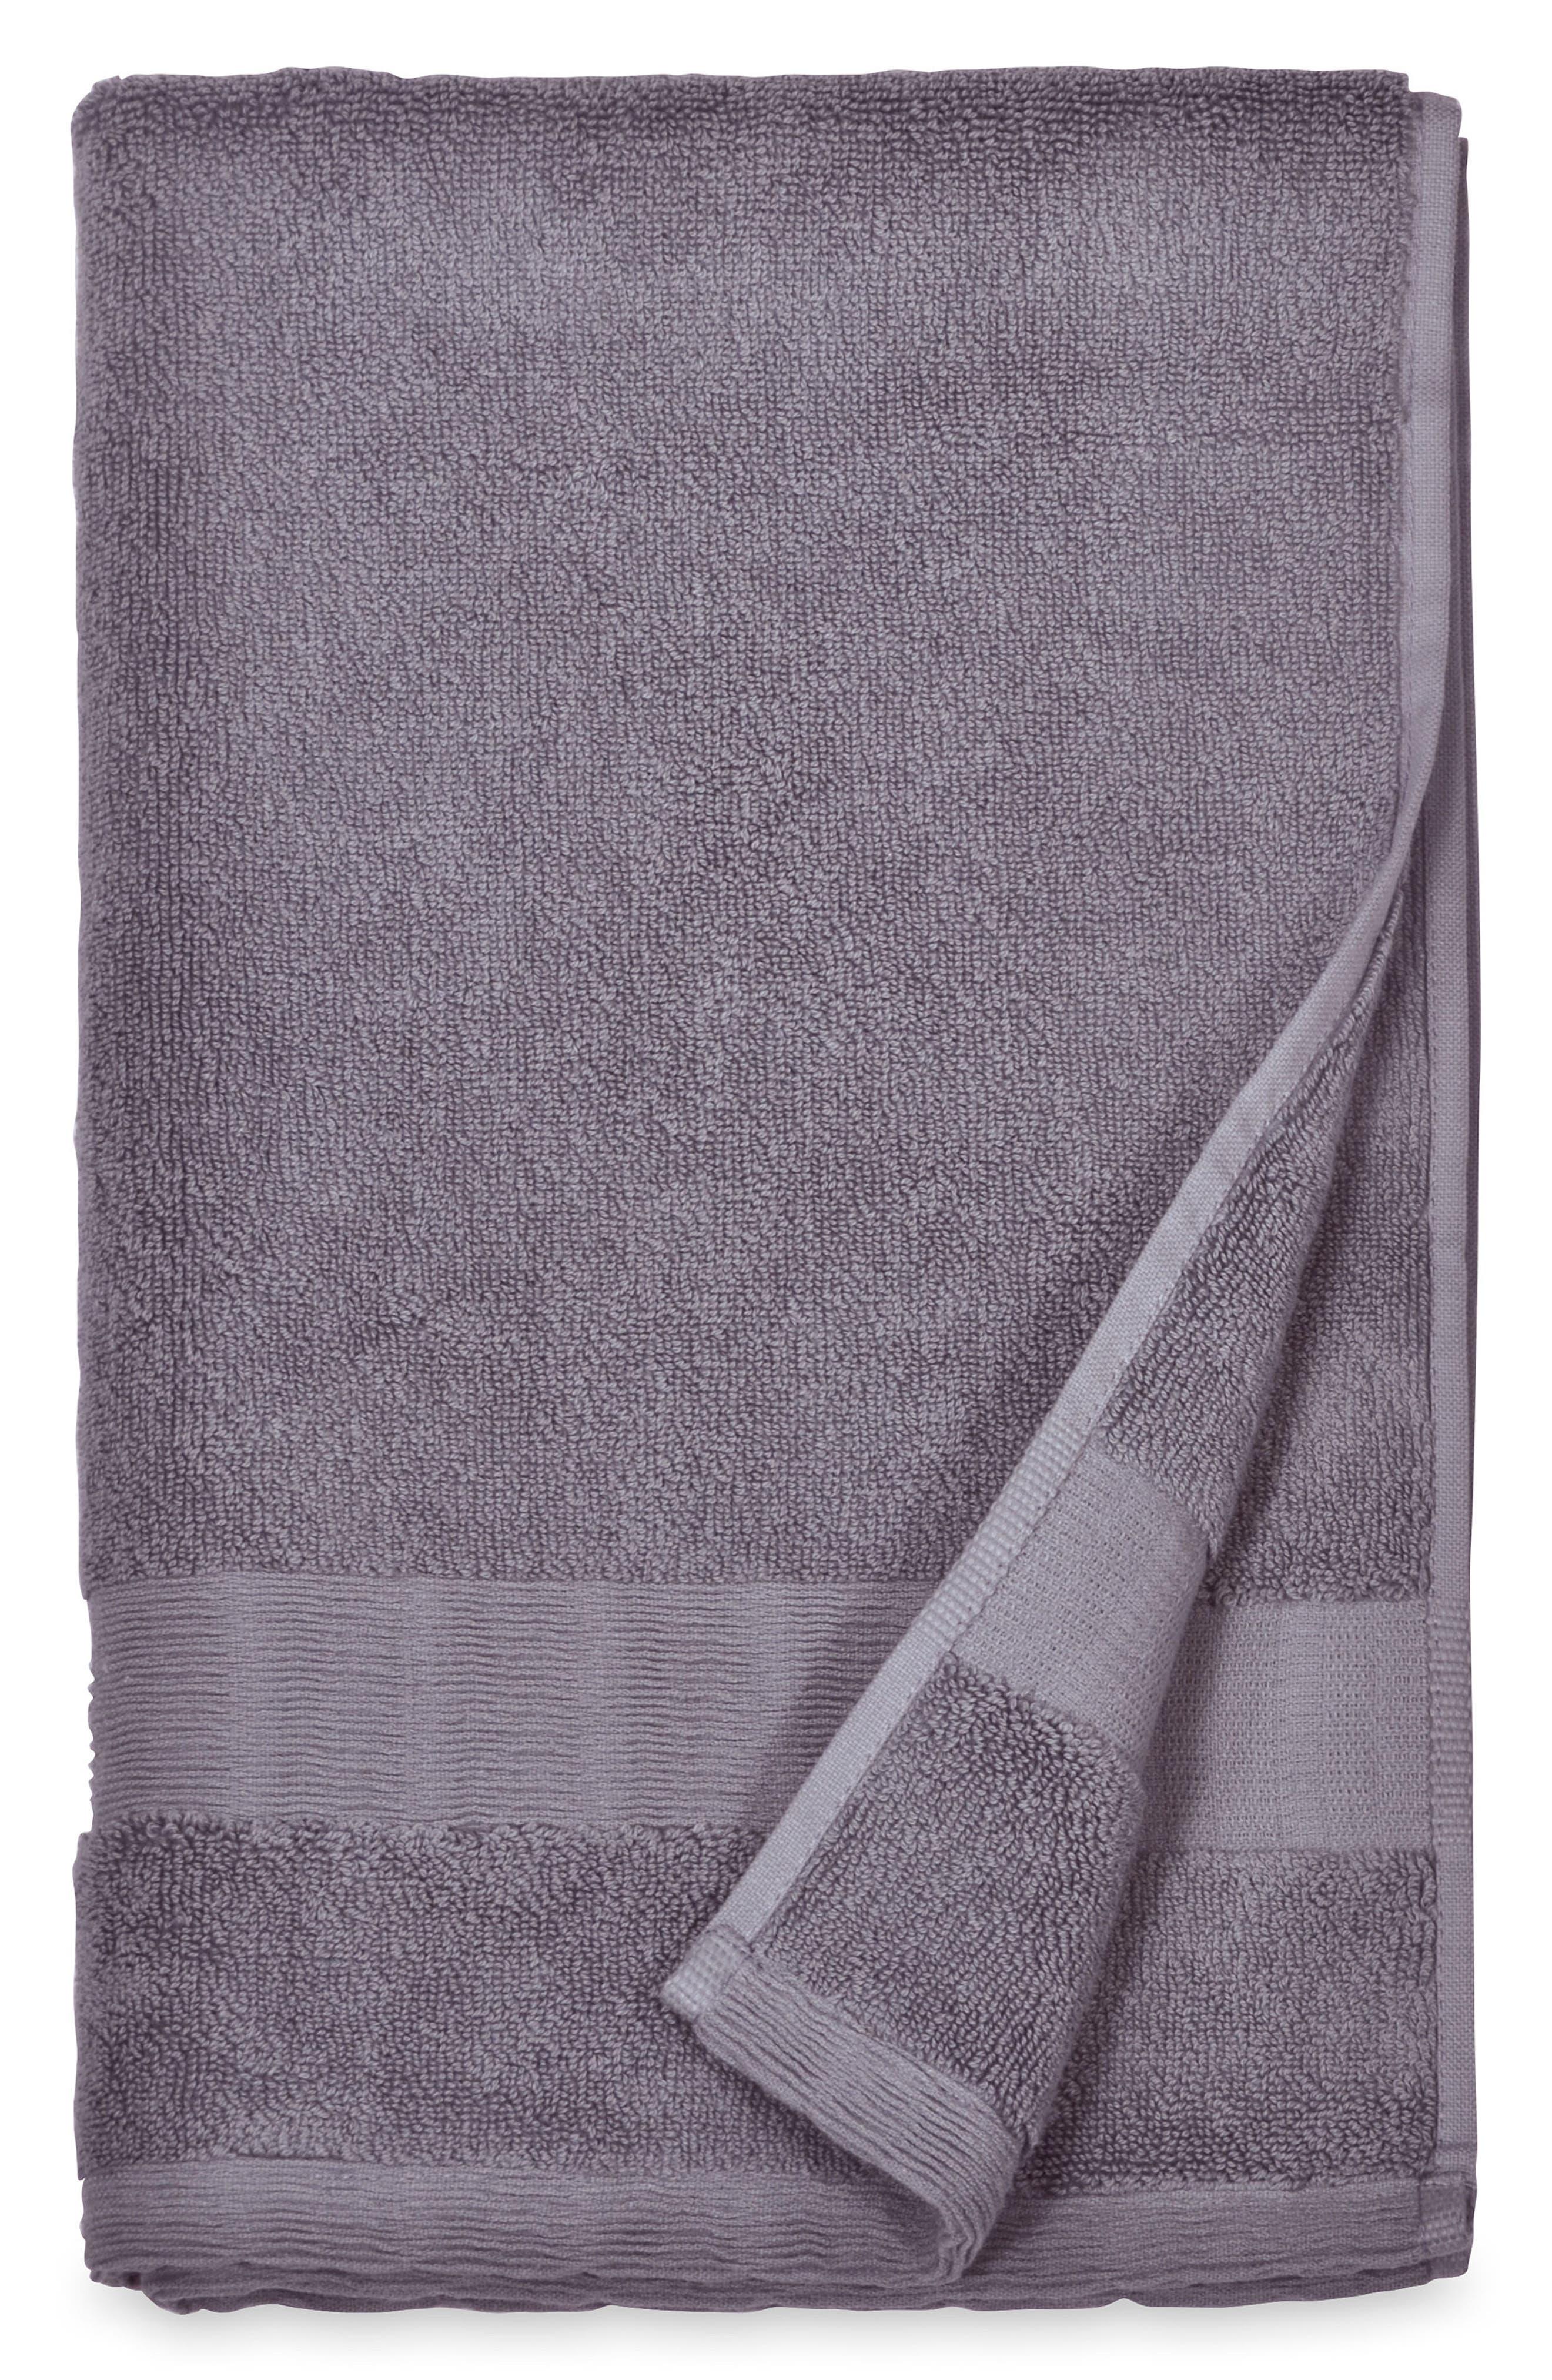 Mercer Hand Towel,                         Main,                         color, 531